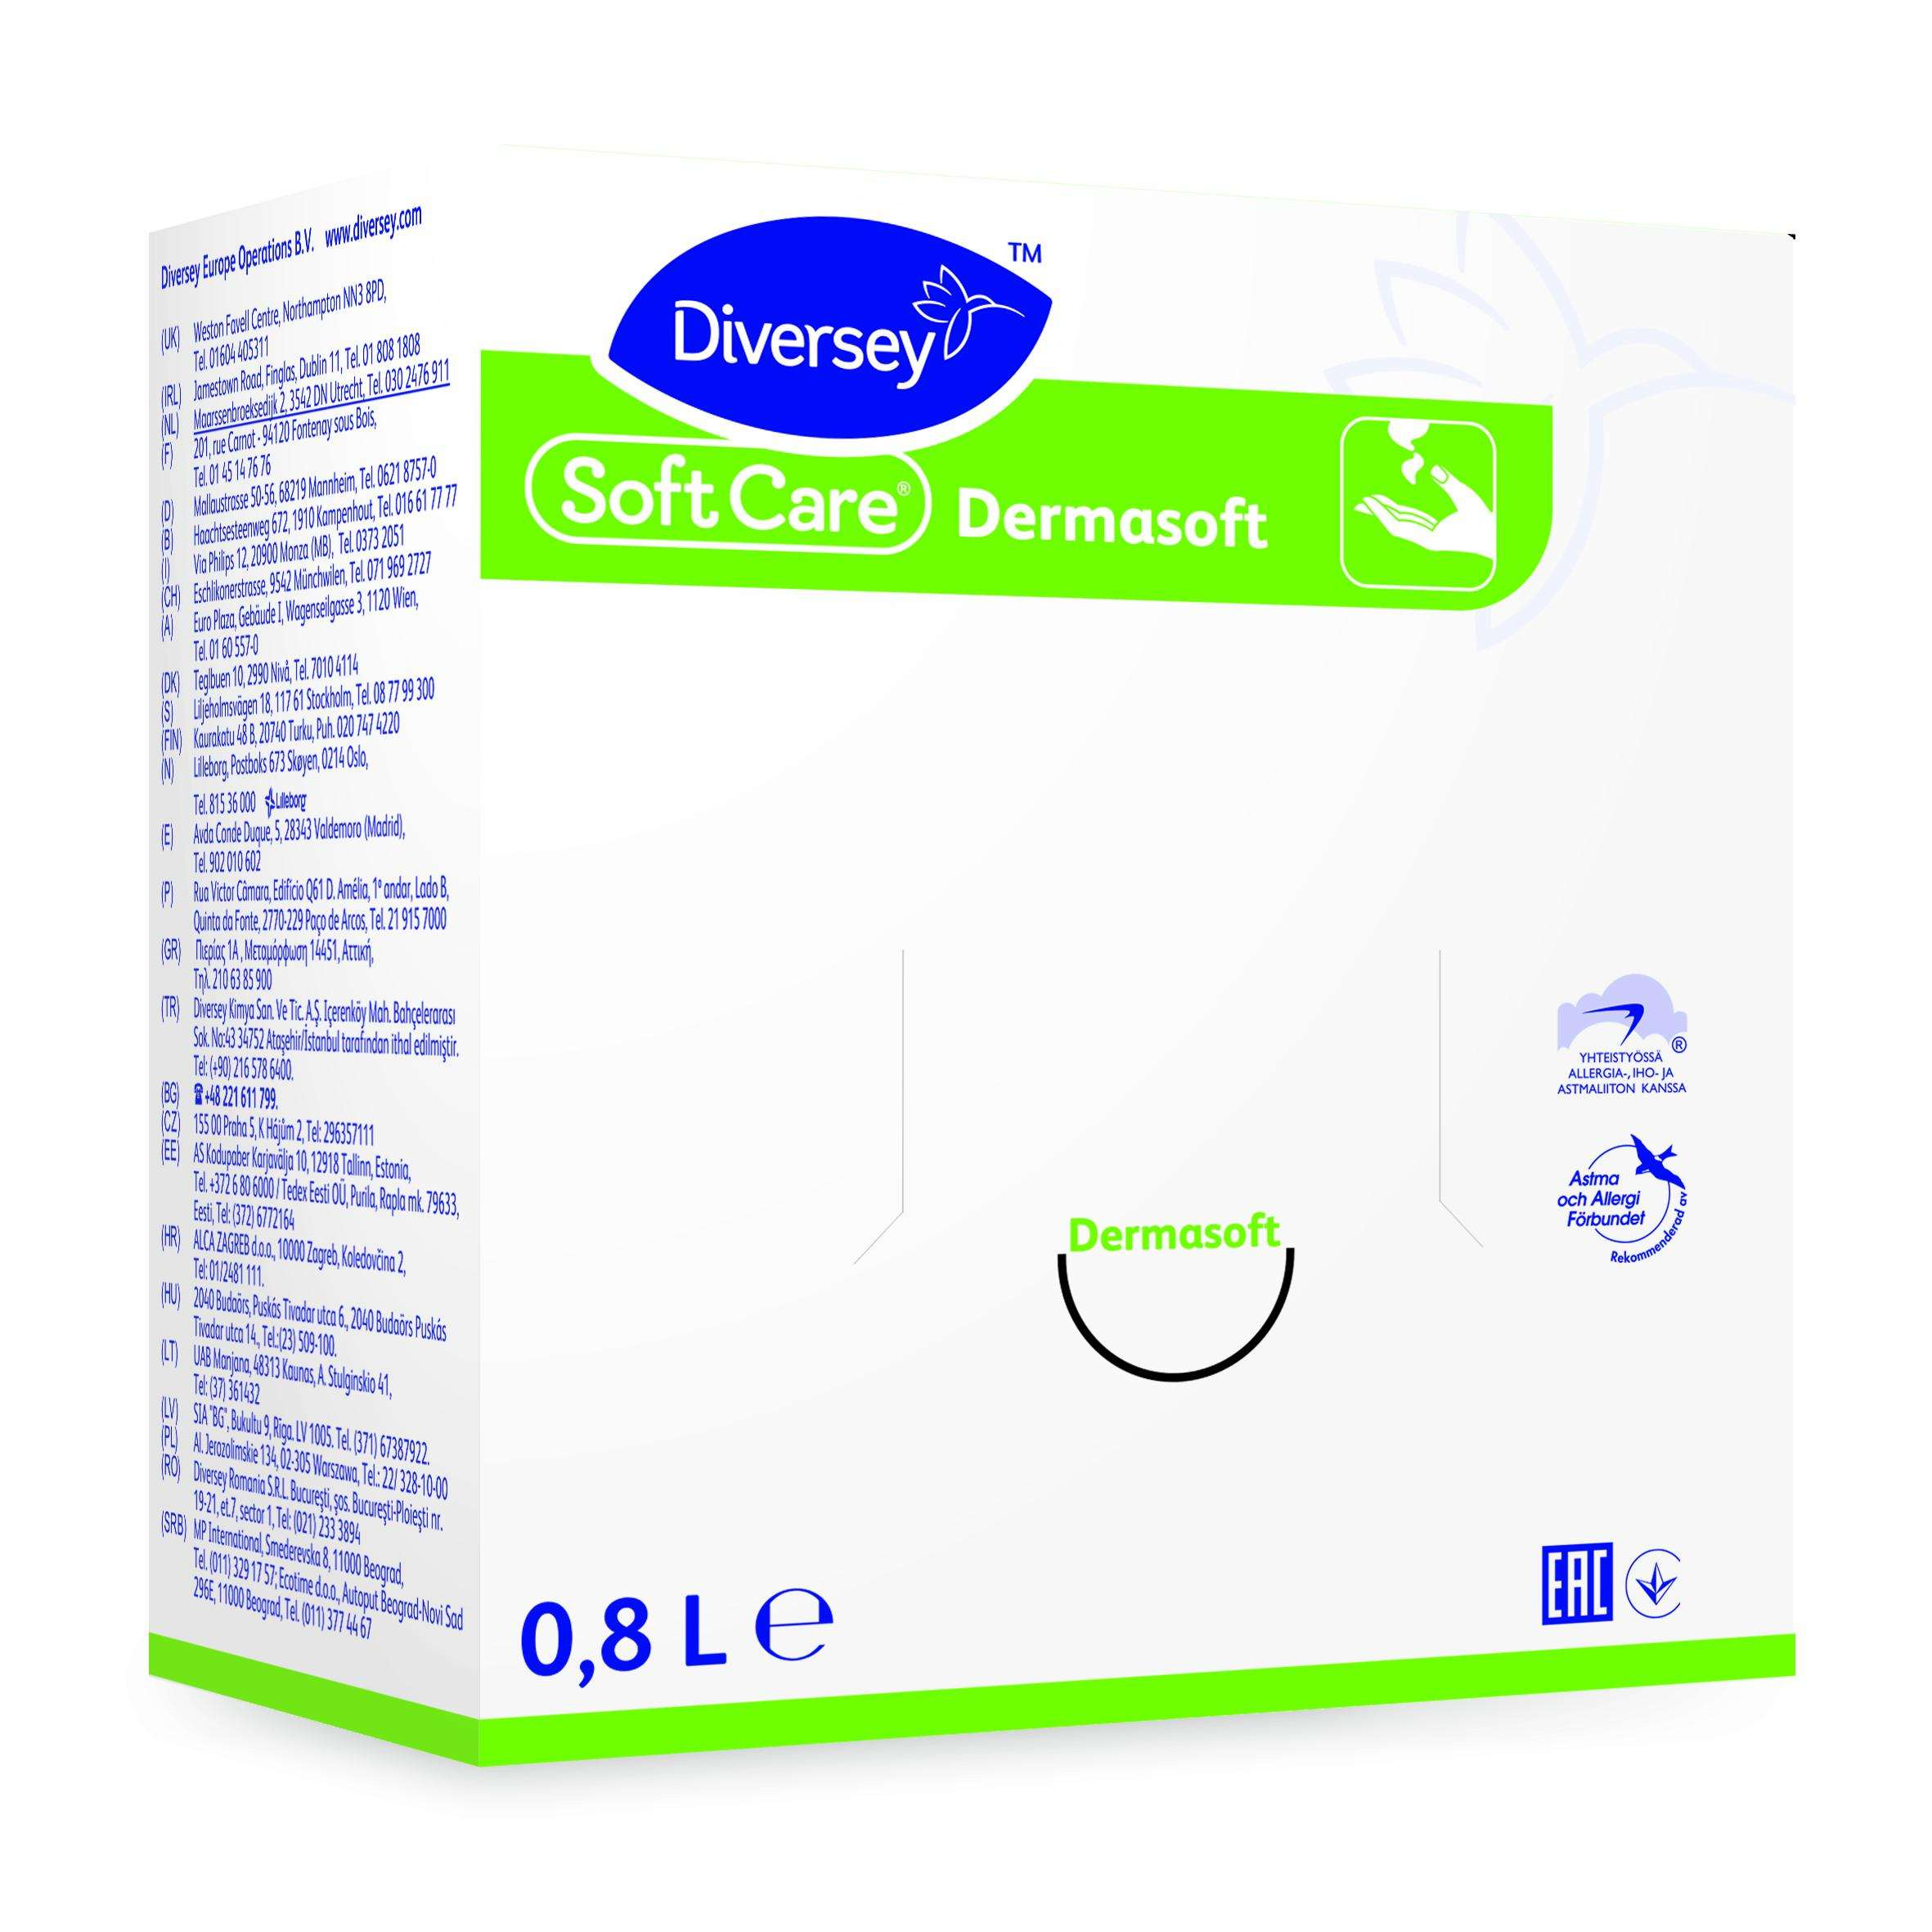 6971740-Soft-care-dermasoft-H9-CMYK-20x20cm.jpg